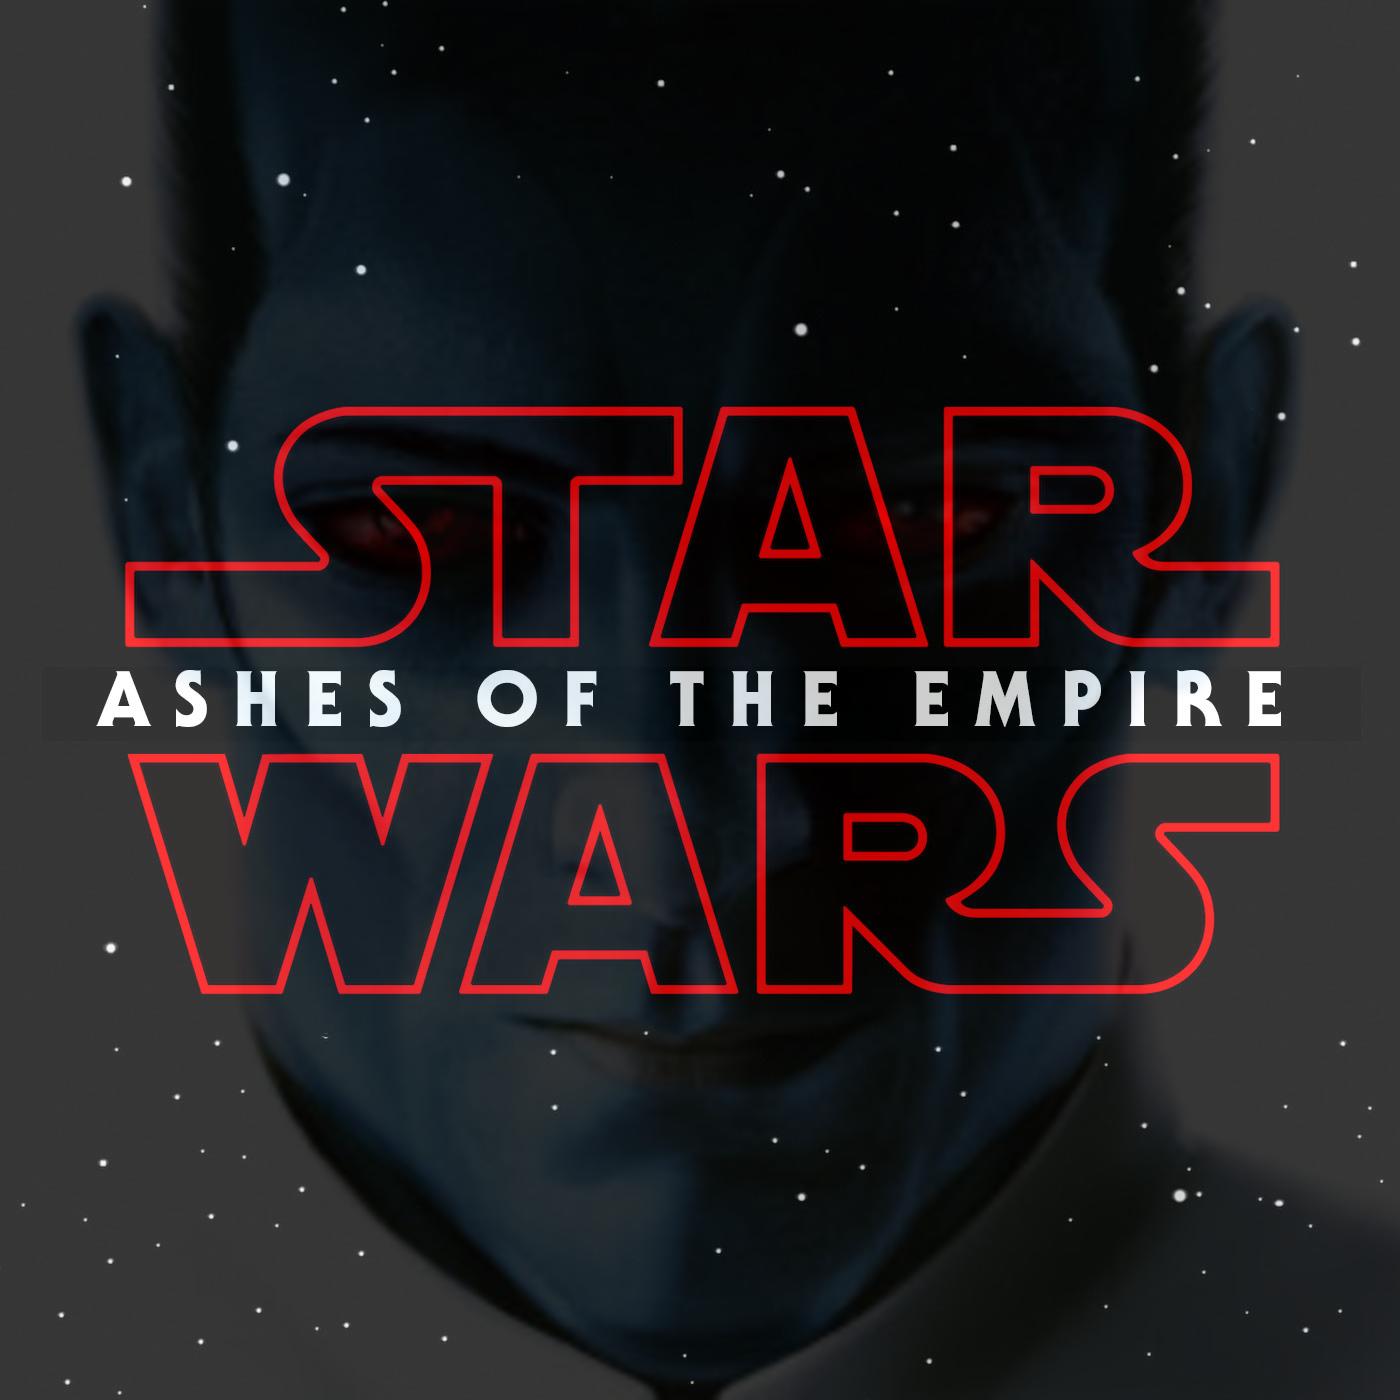 Edge-of-the-Empire-Titlecard-NO-Logo THRAWN.jpg